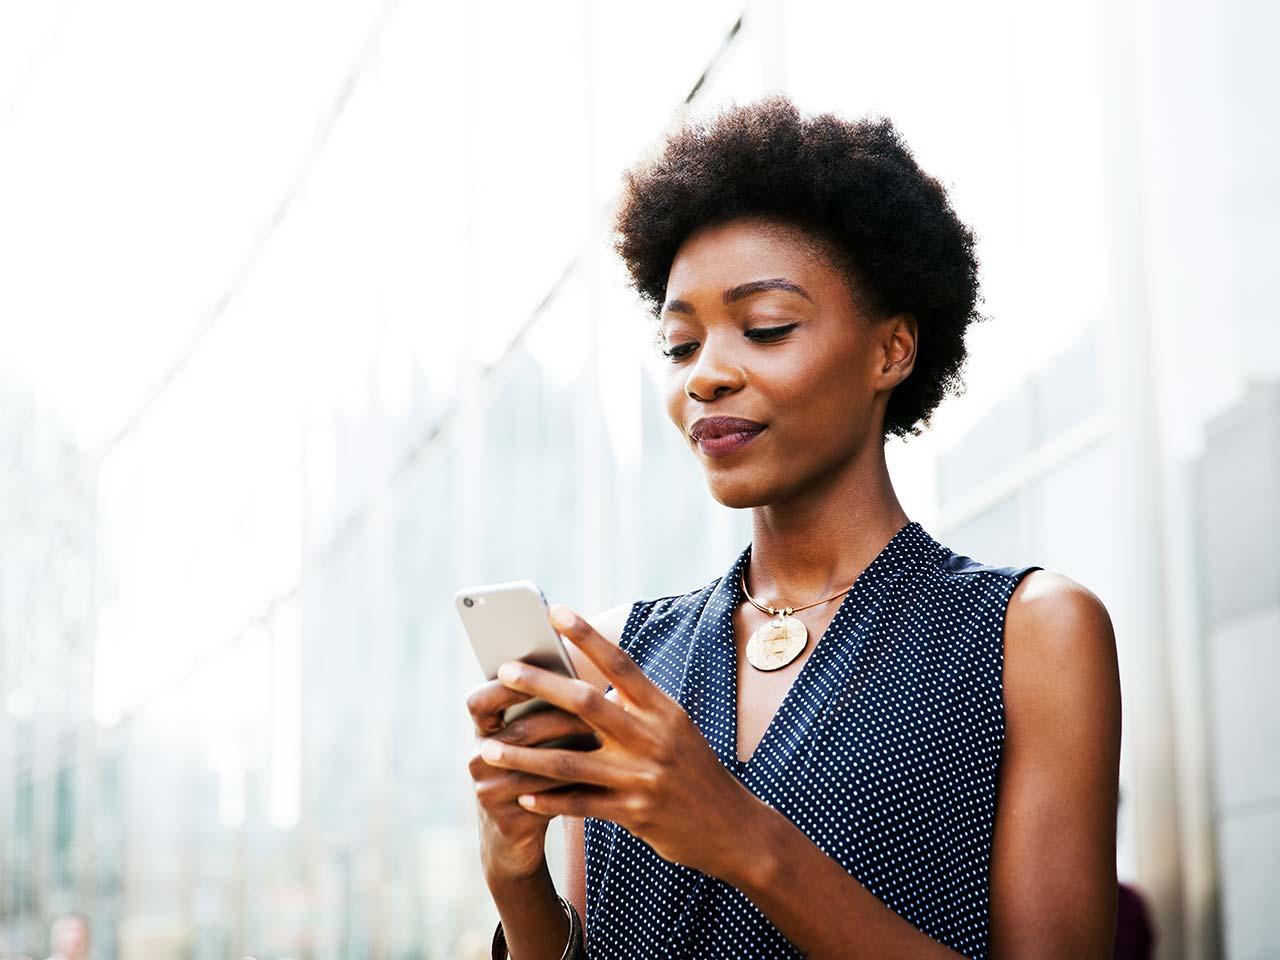 Woman using a cellphone.